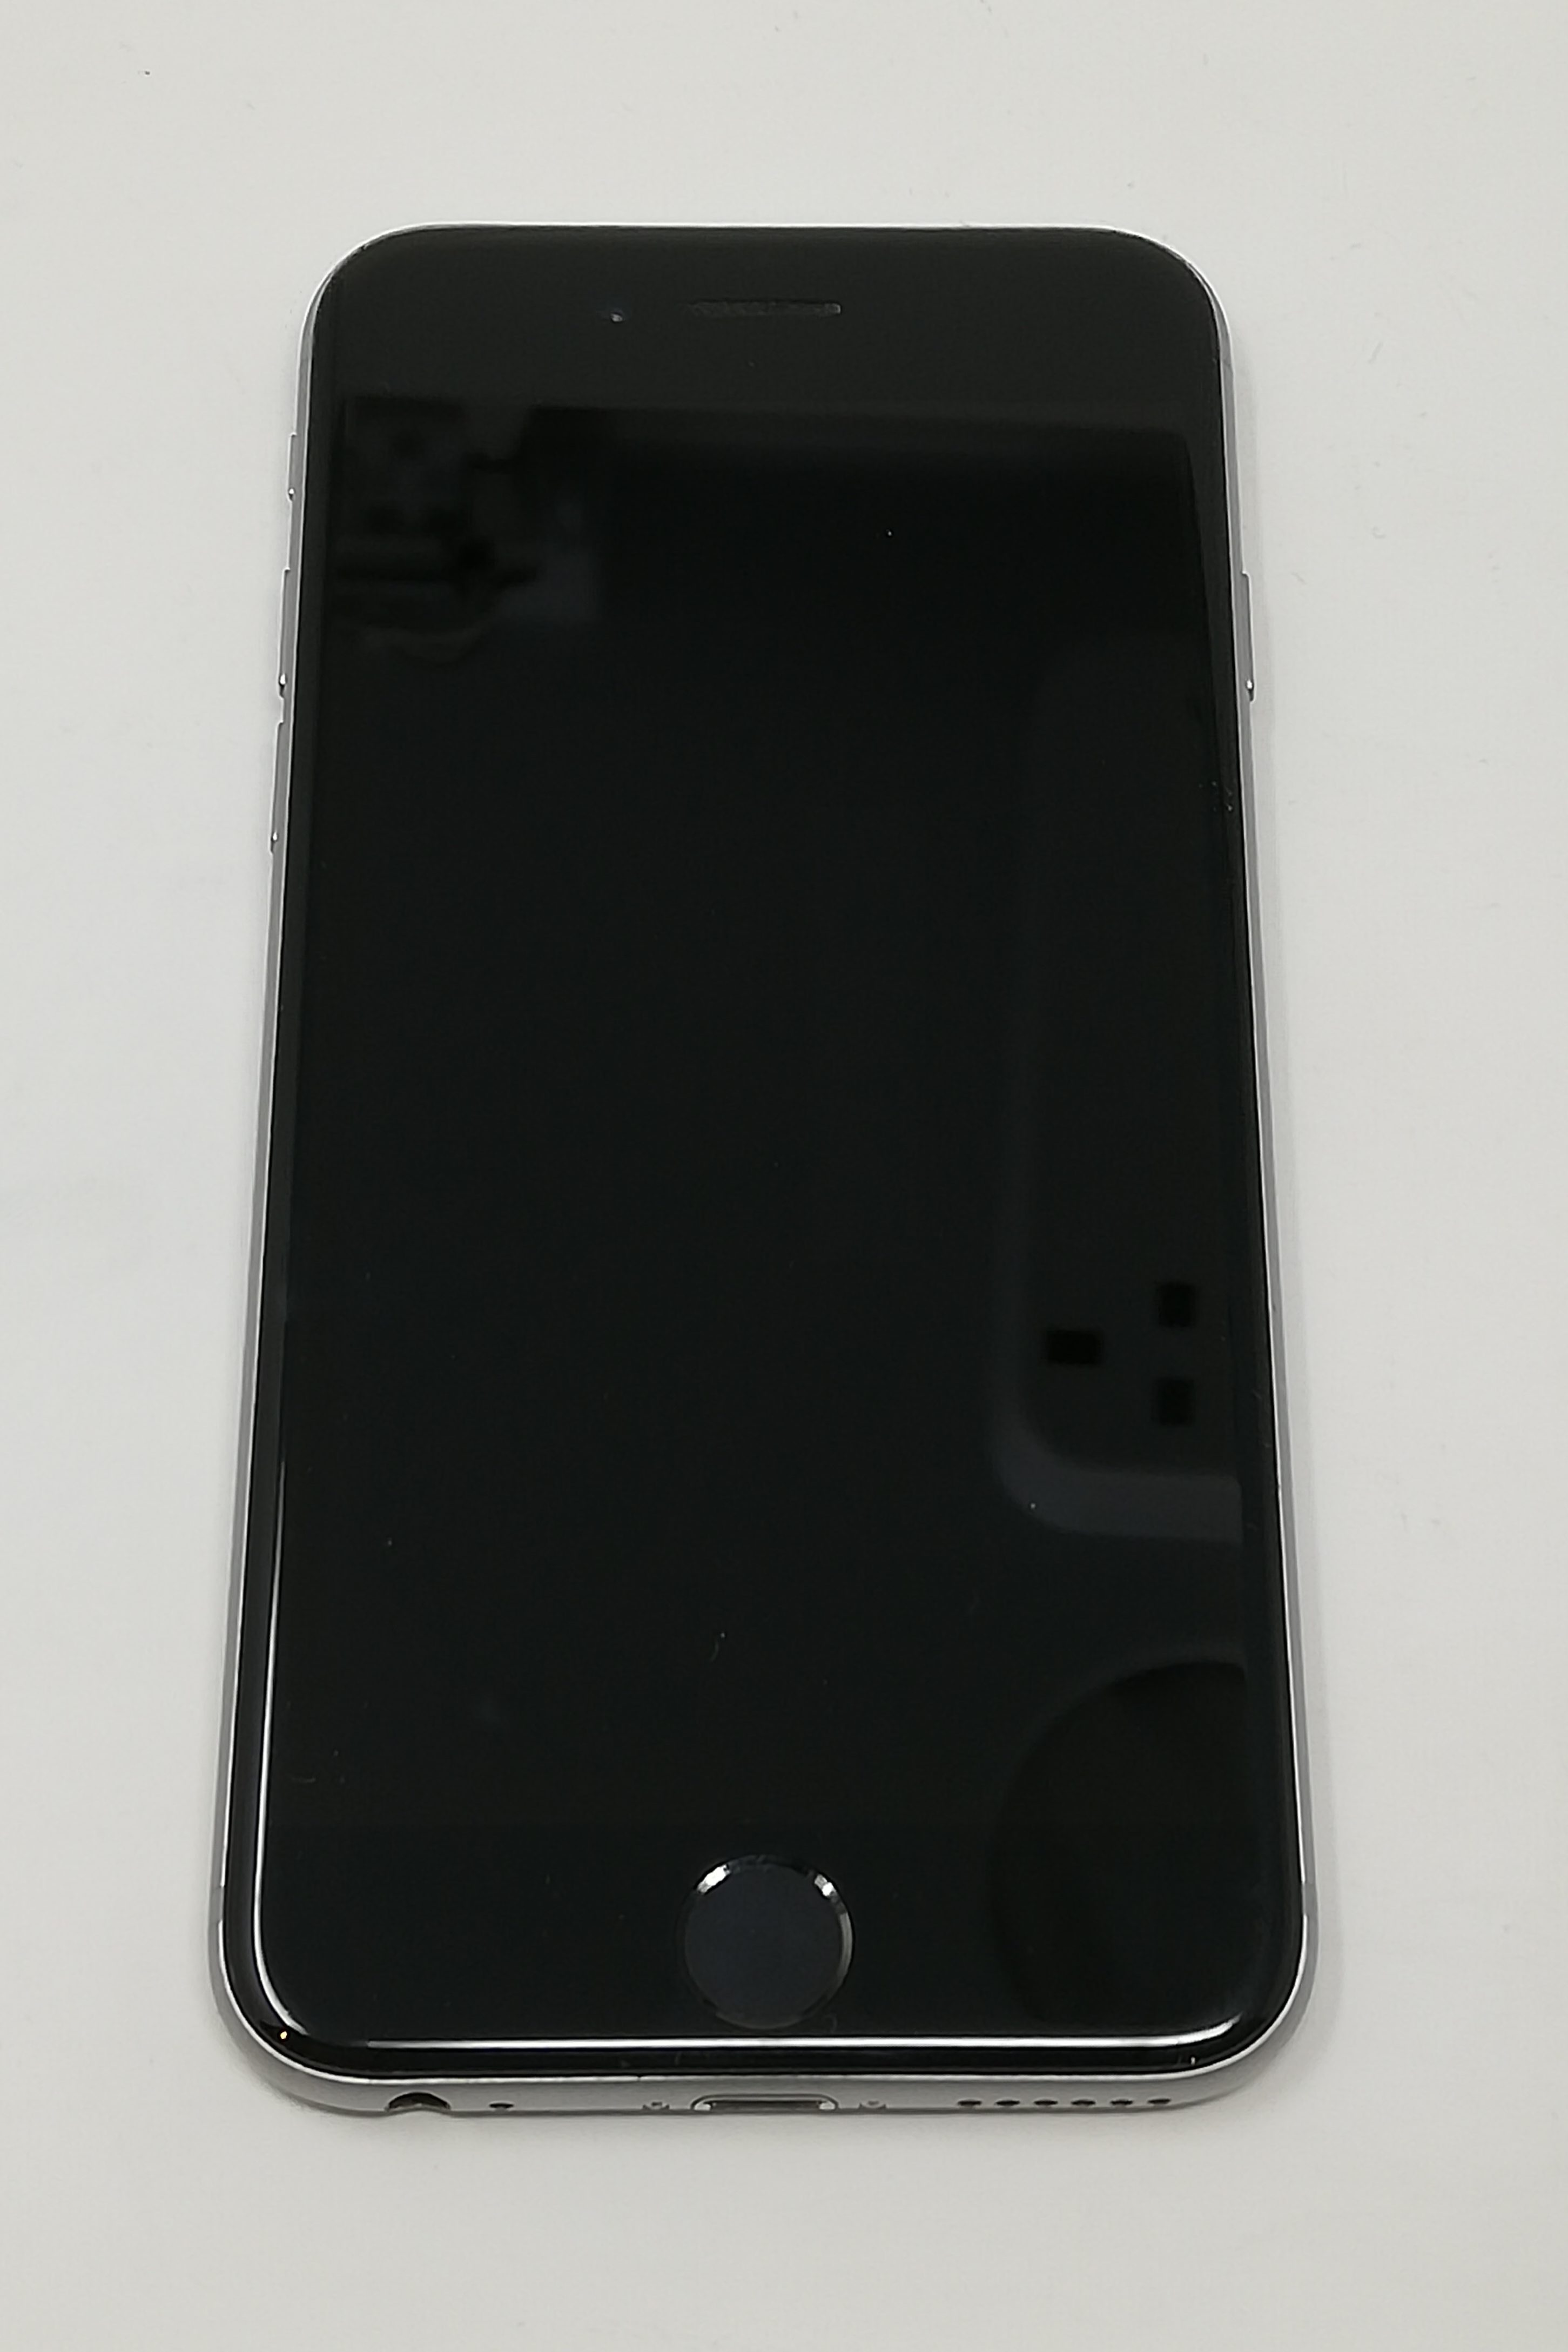 iPhone 6 16GB, 16GB, SPACE GRAY, imagen 1